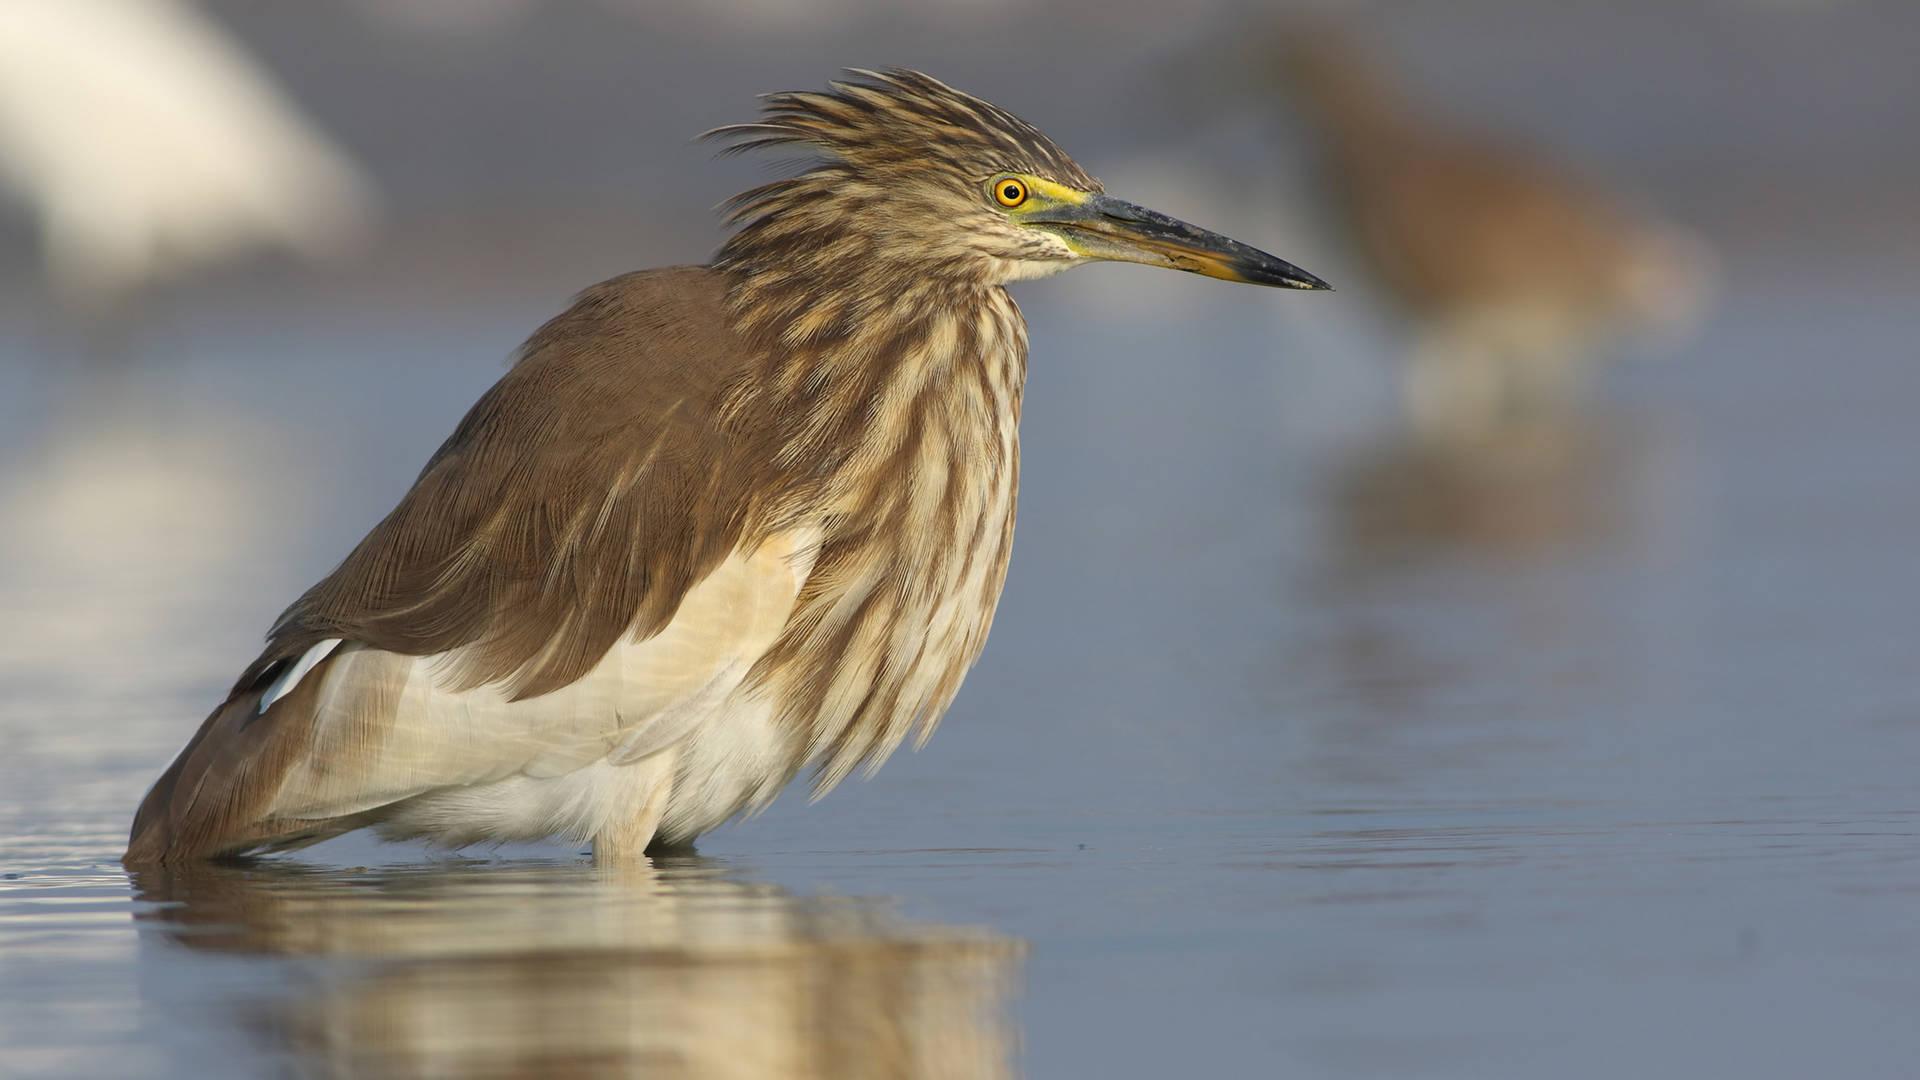 heron reasons to visit Dubai